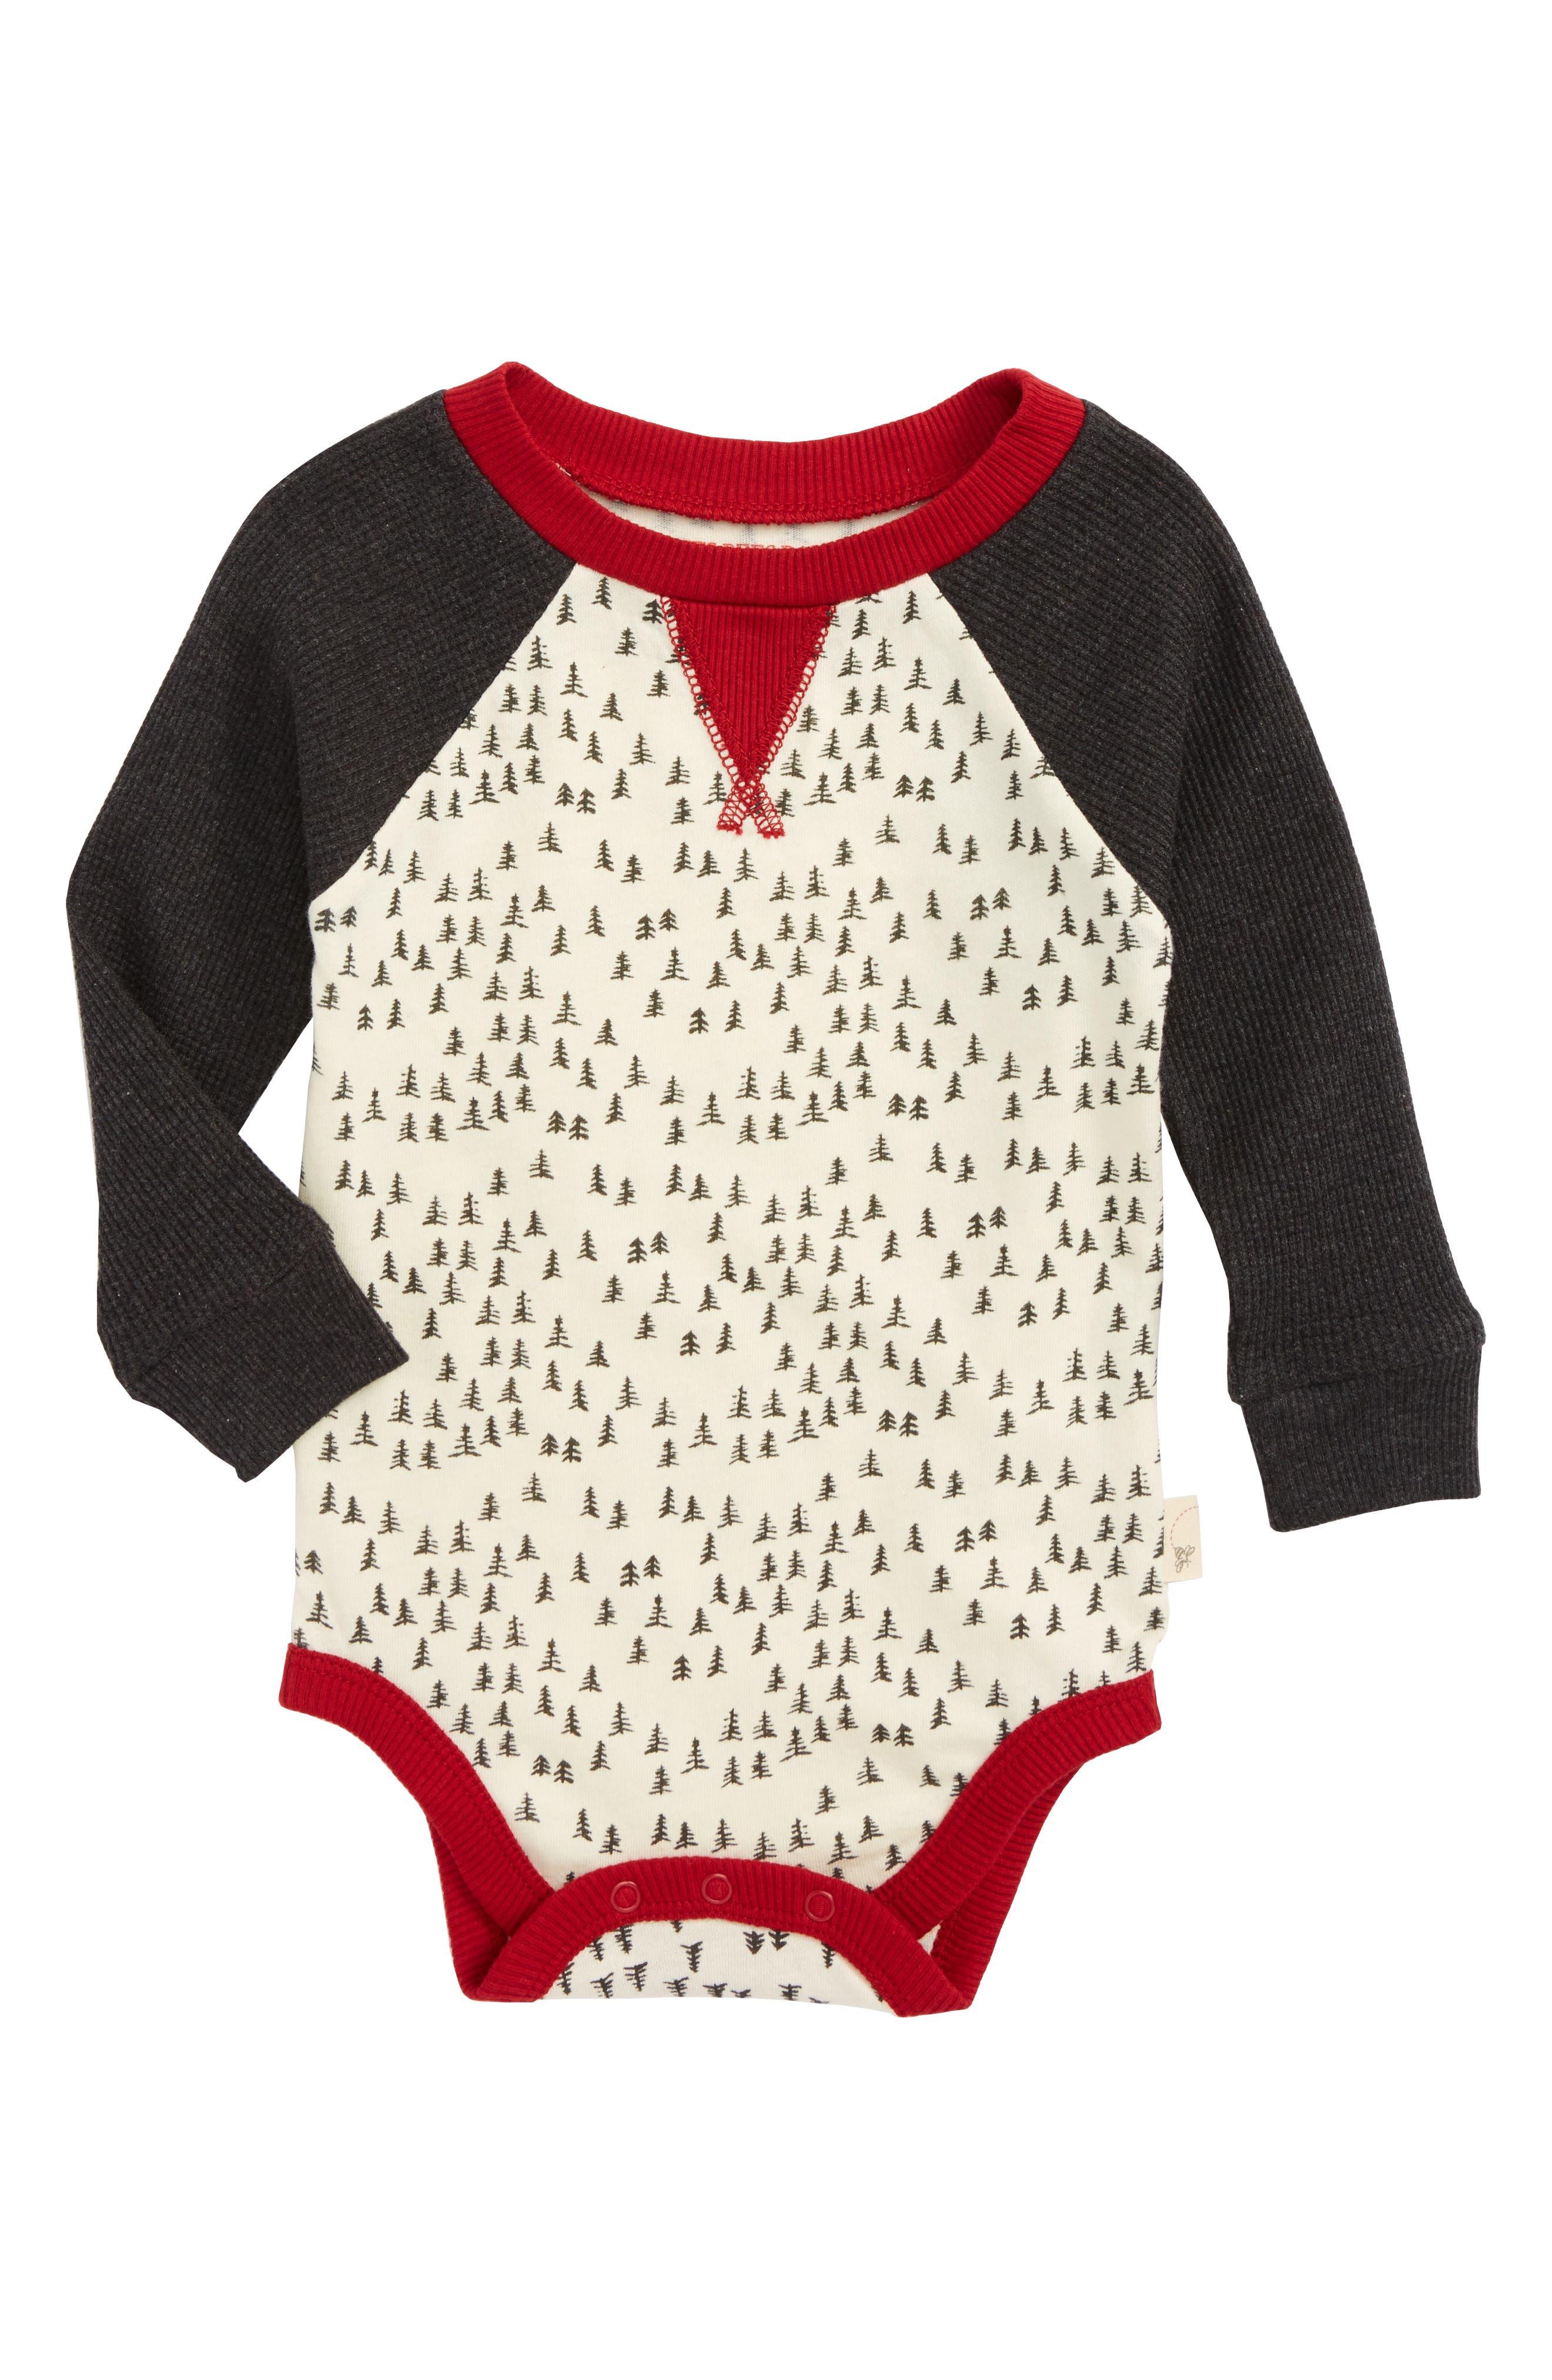 Burt's Bees Baby Organic Cotton Bodysuit (Baby)